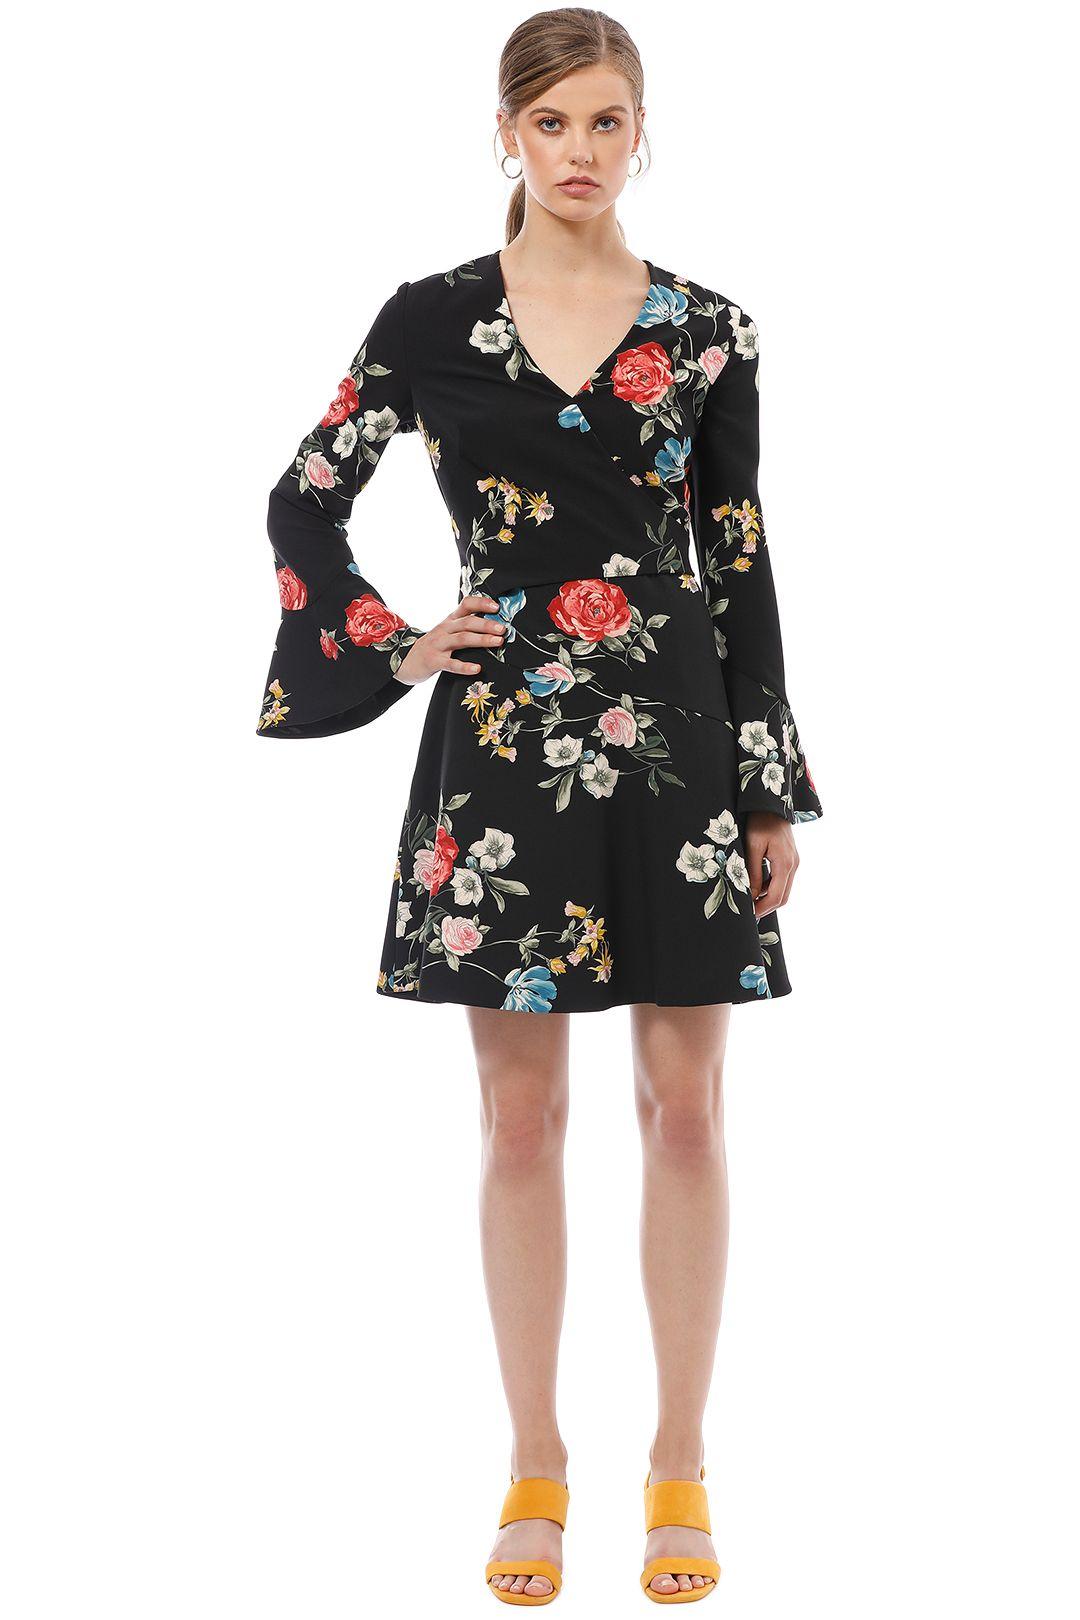 Cue - Watercolour Rose Long Sleeve Dress - Black Floral - Front